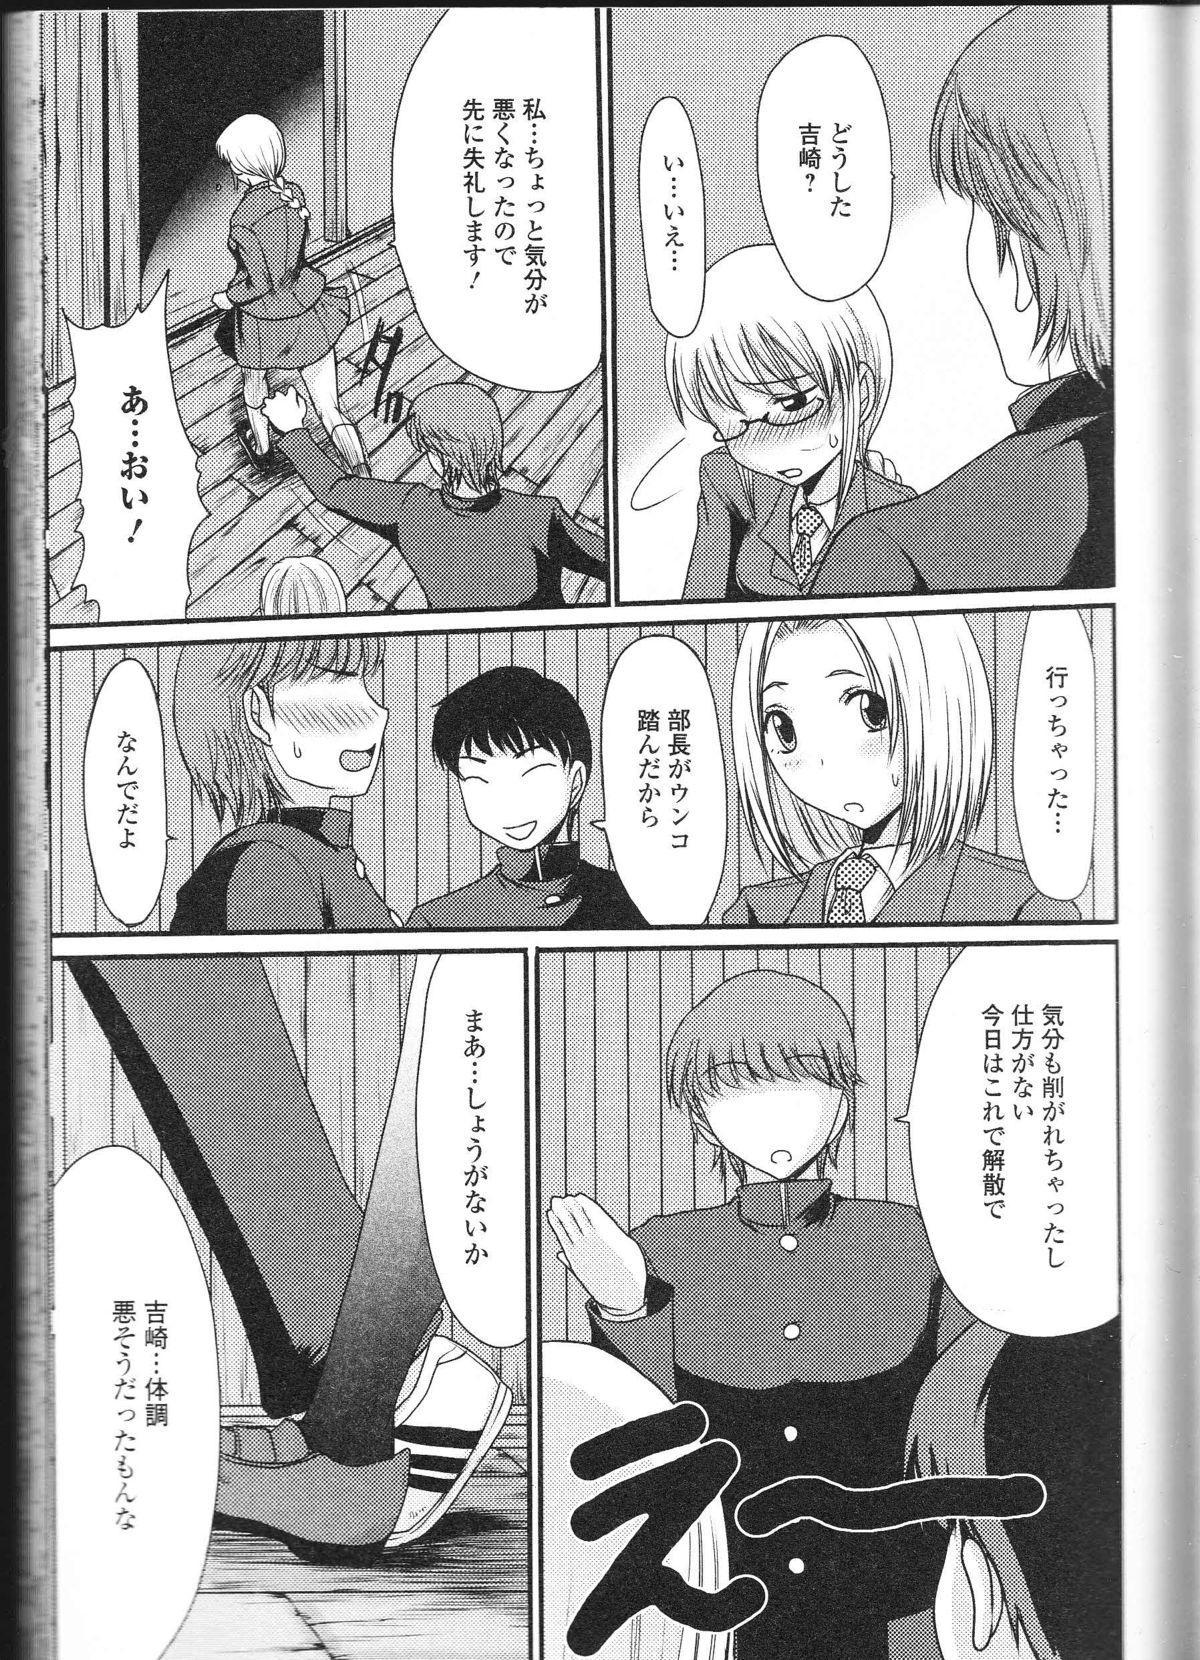 Nozoite wa Ikenai 9 - Do Not Peep! 9 113